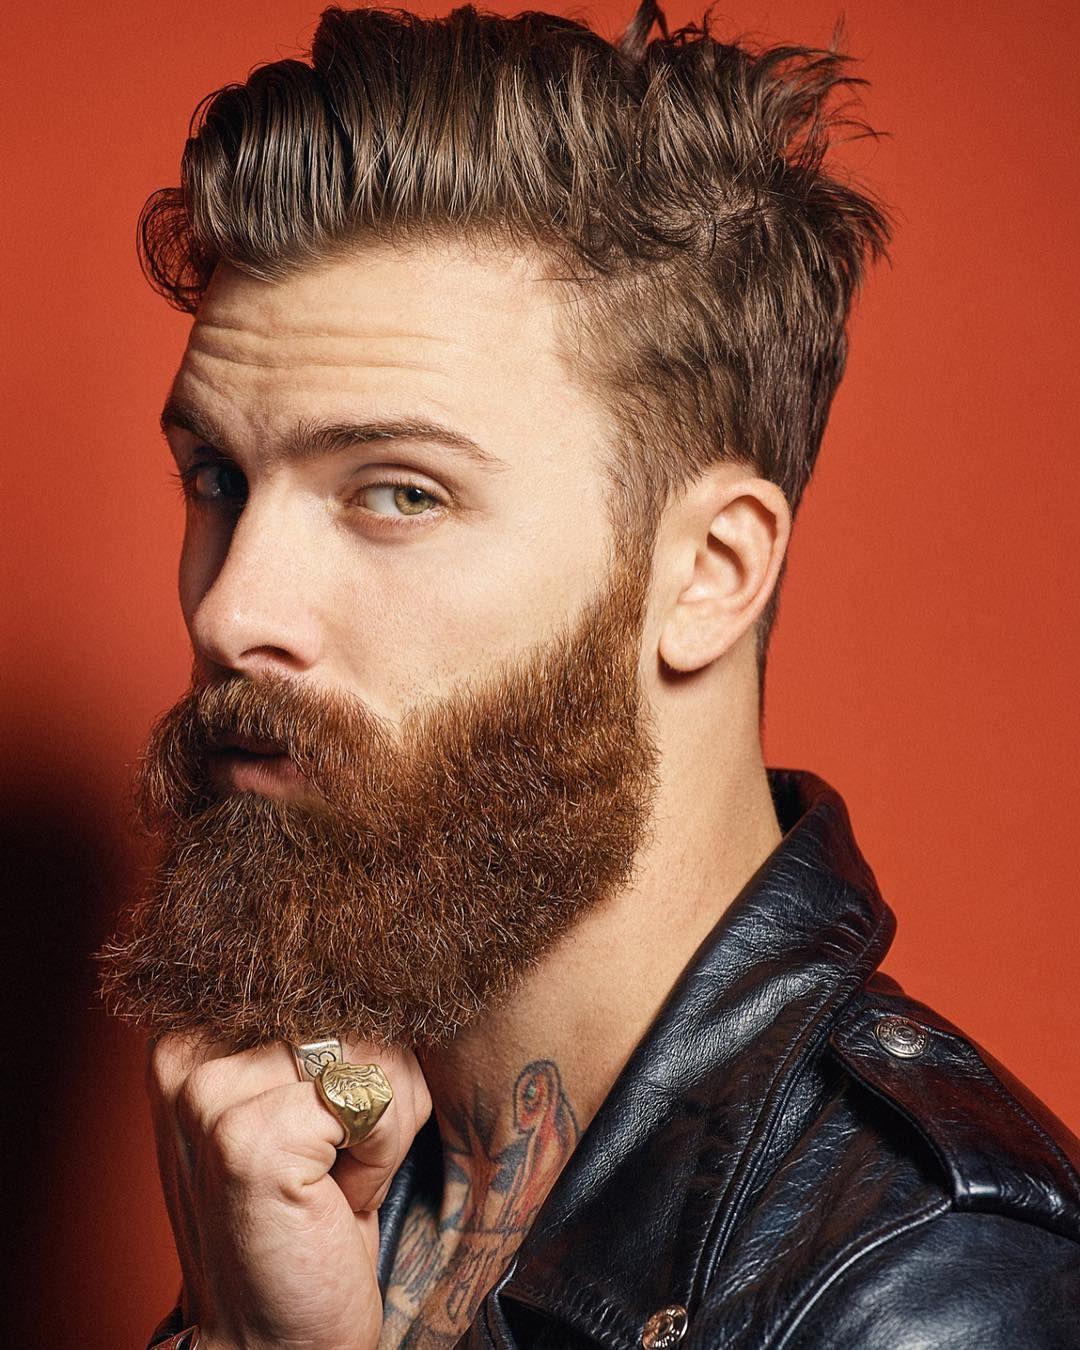 Stylish haircuts for men with thick hair consulta esta foto de instagram de beardhub u  me gusta  deep as